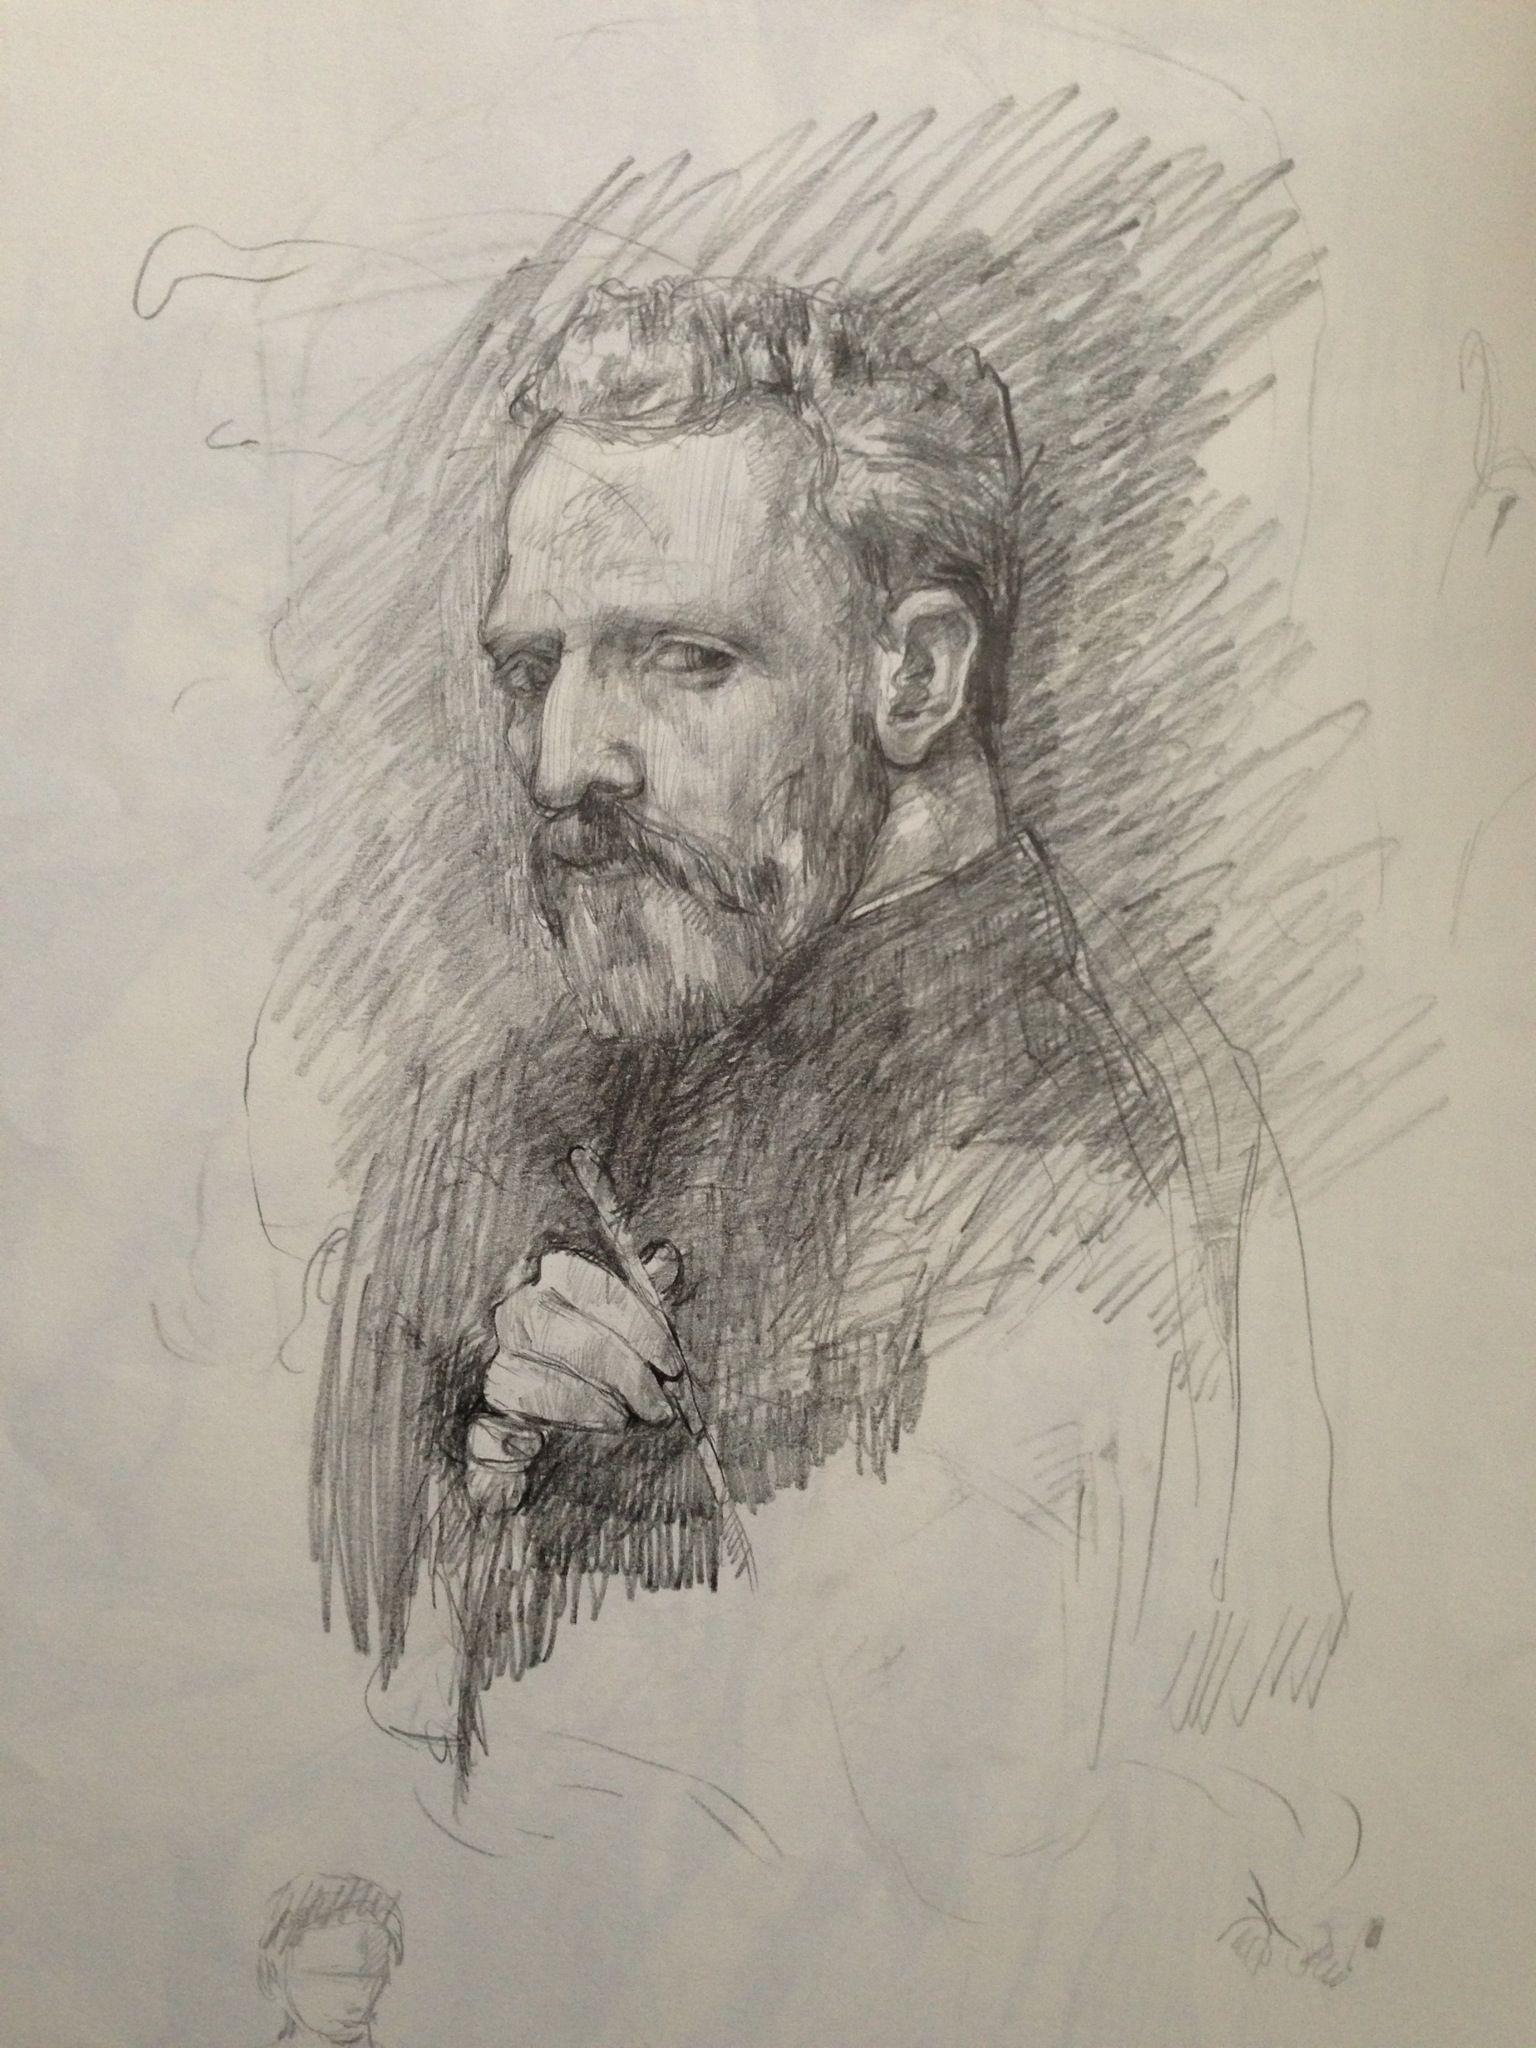 Vincent van Gogh sketch. By @Adil Can Nalkiran. Hayranın olarak. :D